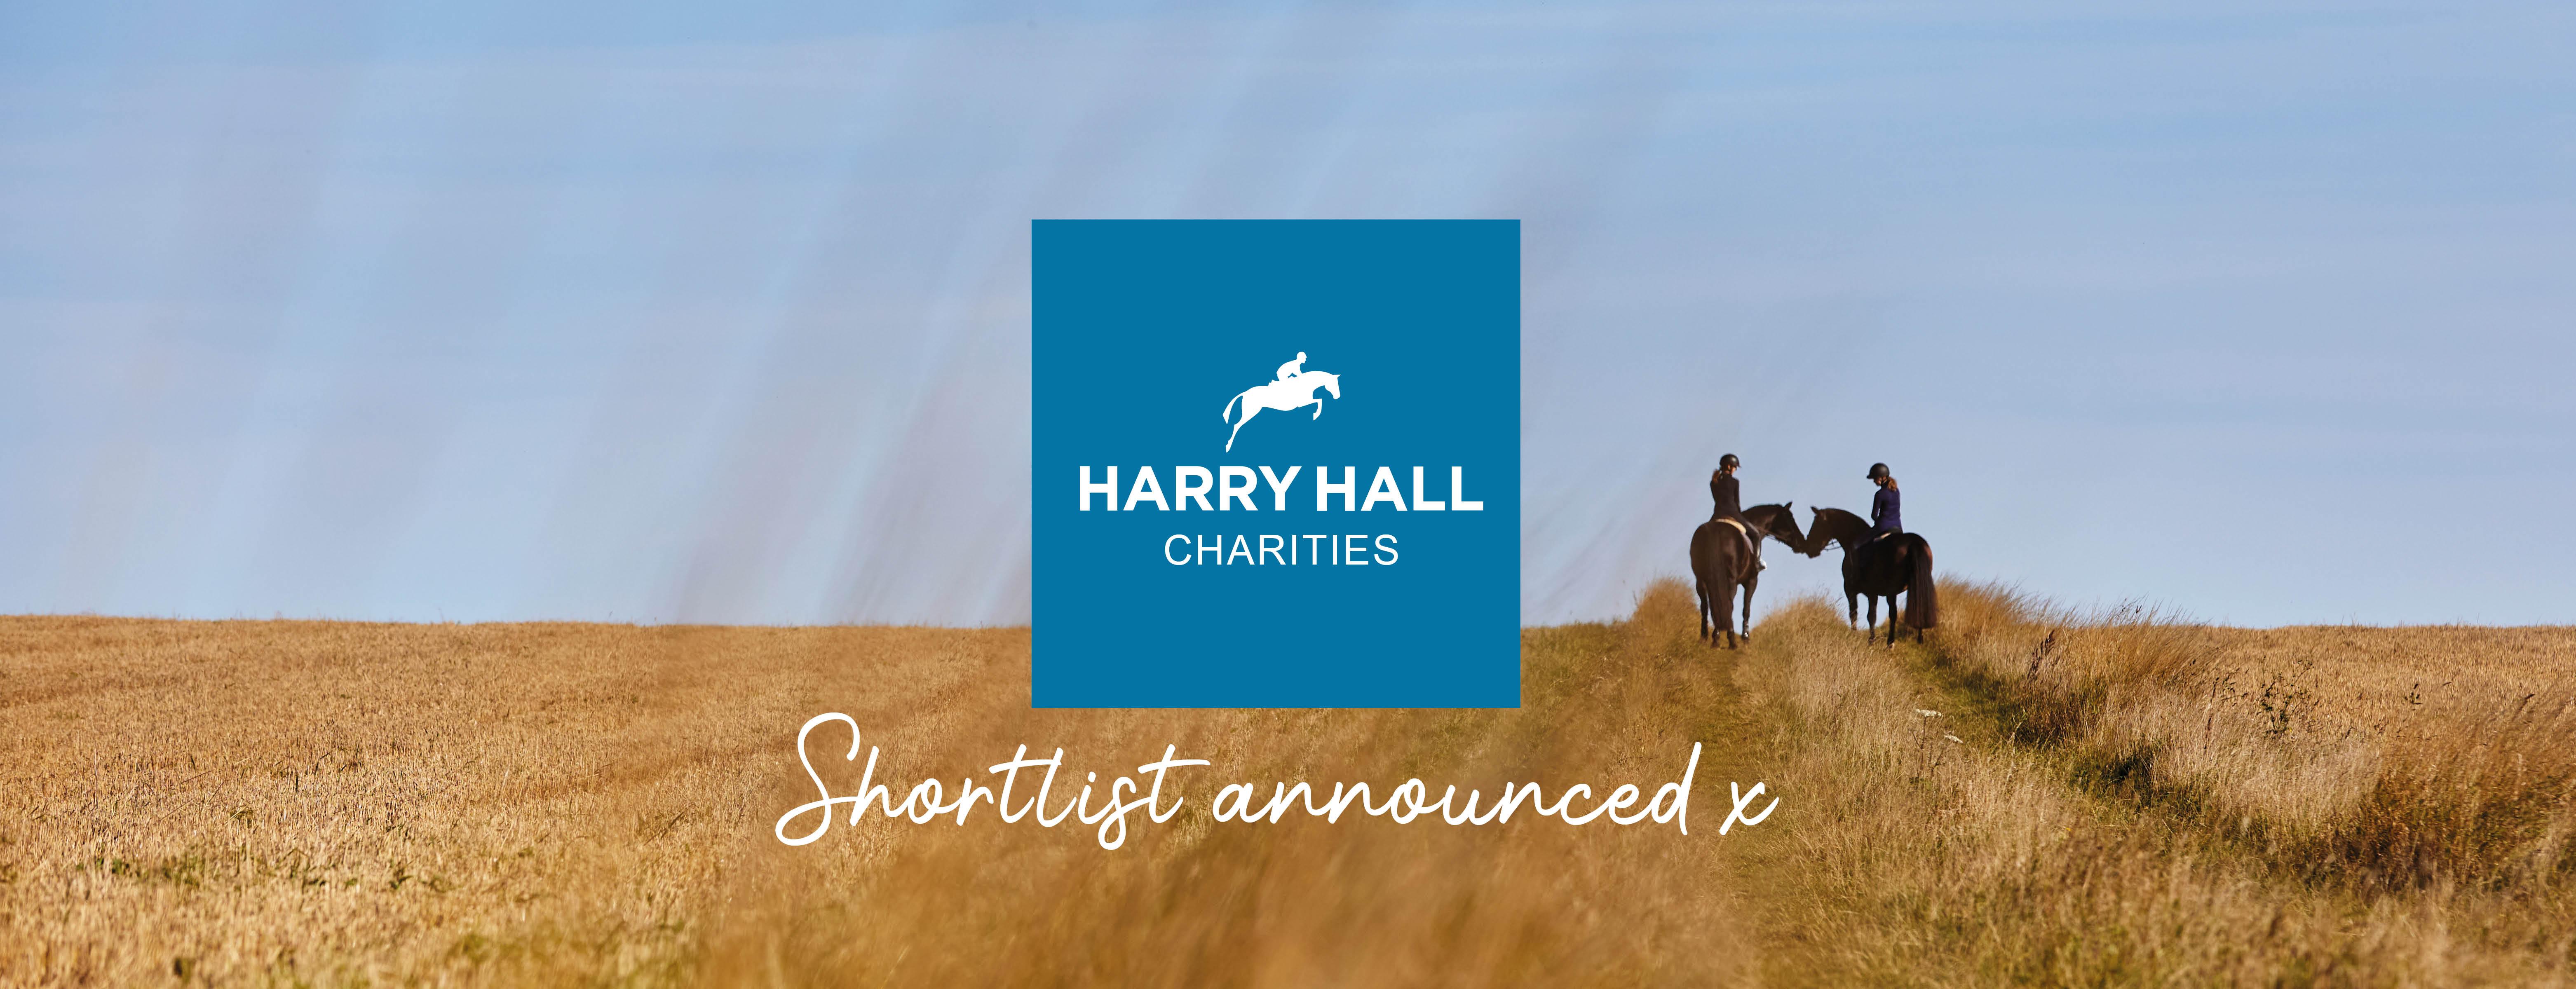 Harry Hall Charity